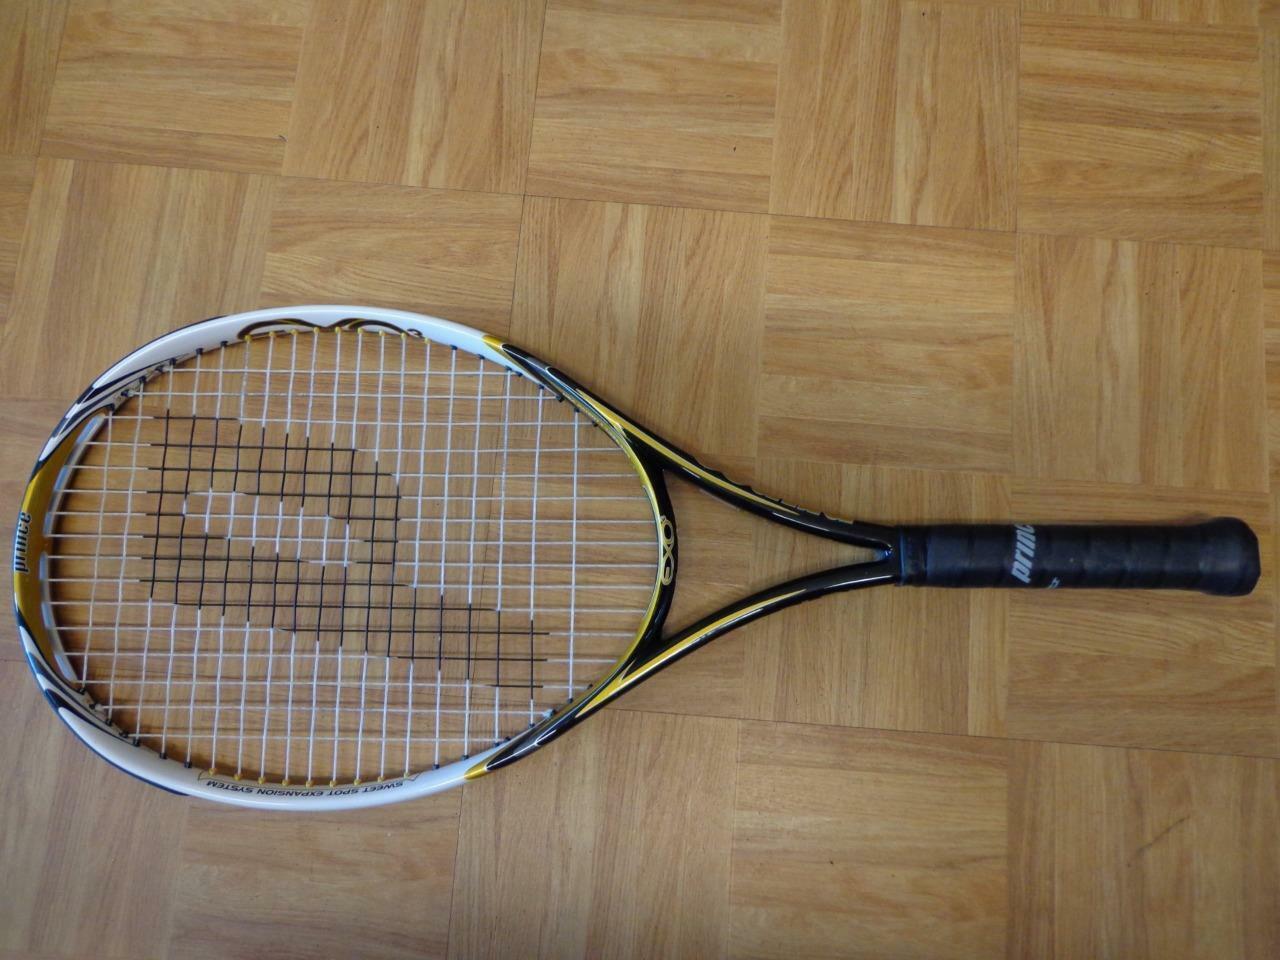 Prince EXO3 Hybrid Hybrid Hybrid oro 107 head 4 1/2 grip Tennis Racquet fe57ad